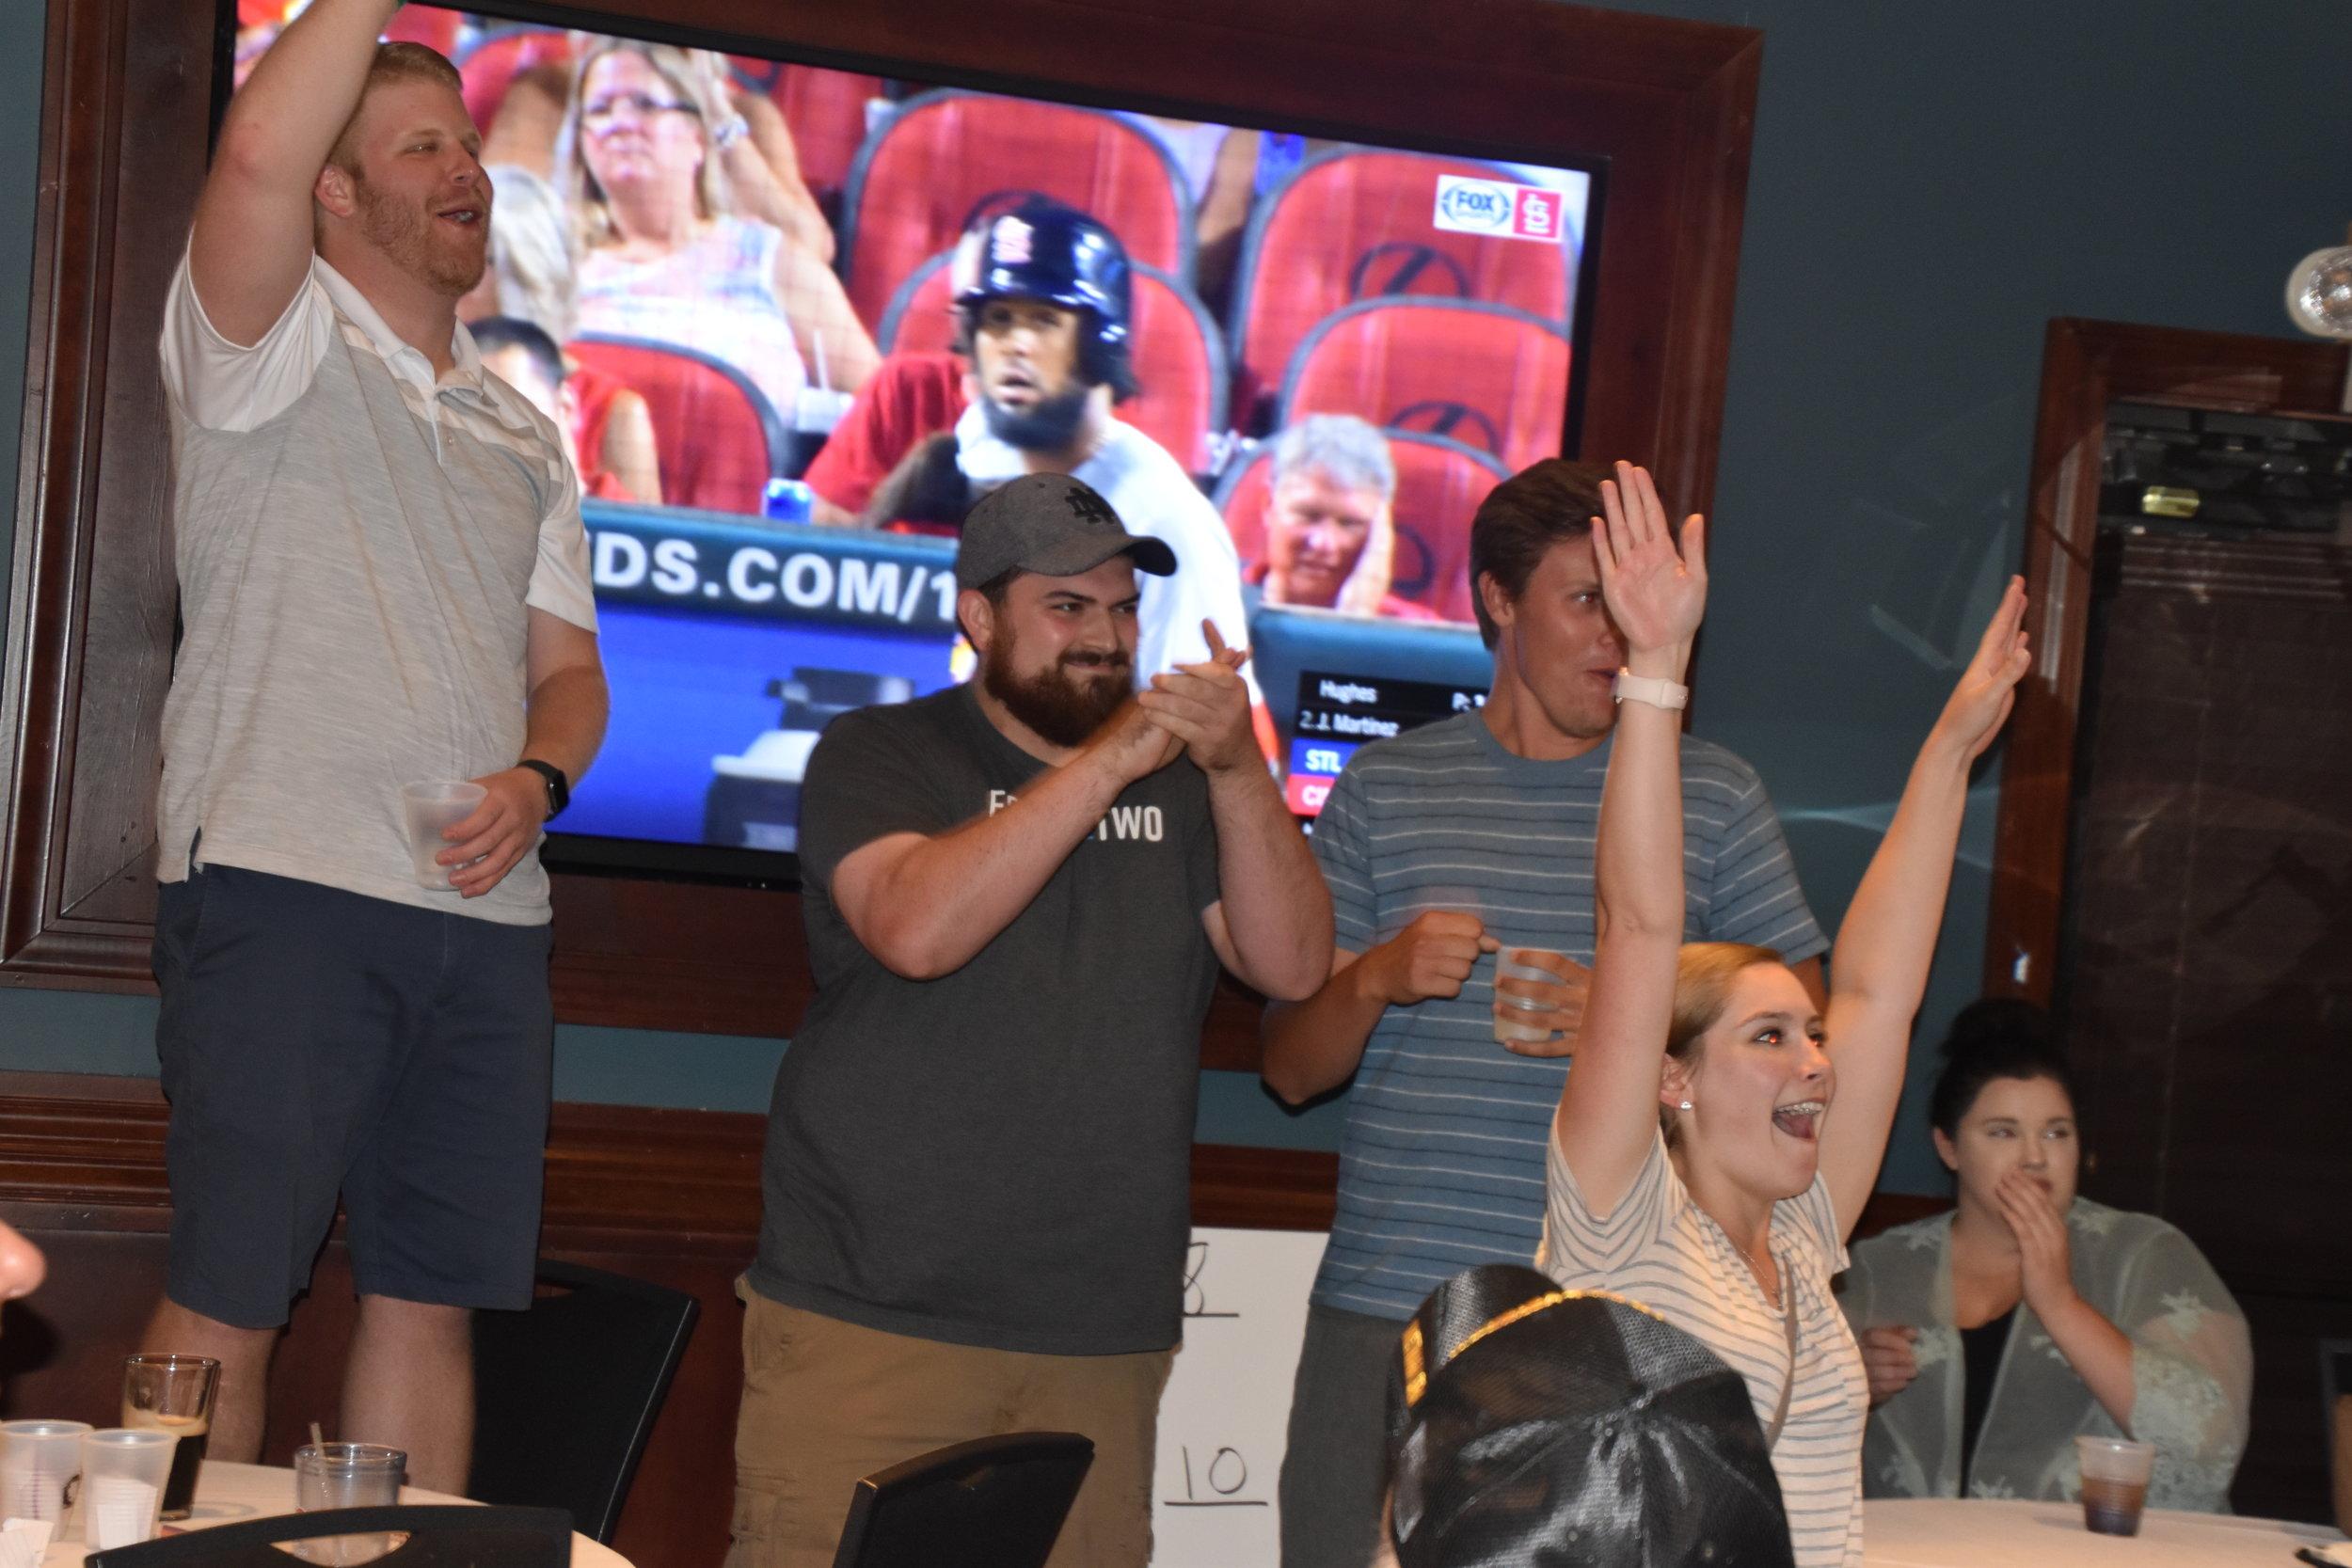 Ryan, Ciarah, and Garrett celebrate the drawing of their A player - Pat Sorrentino!